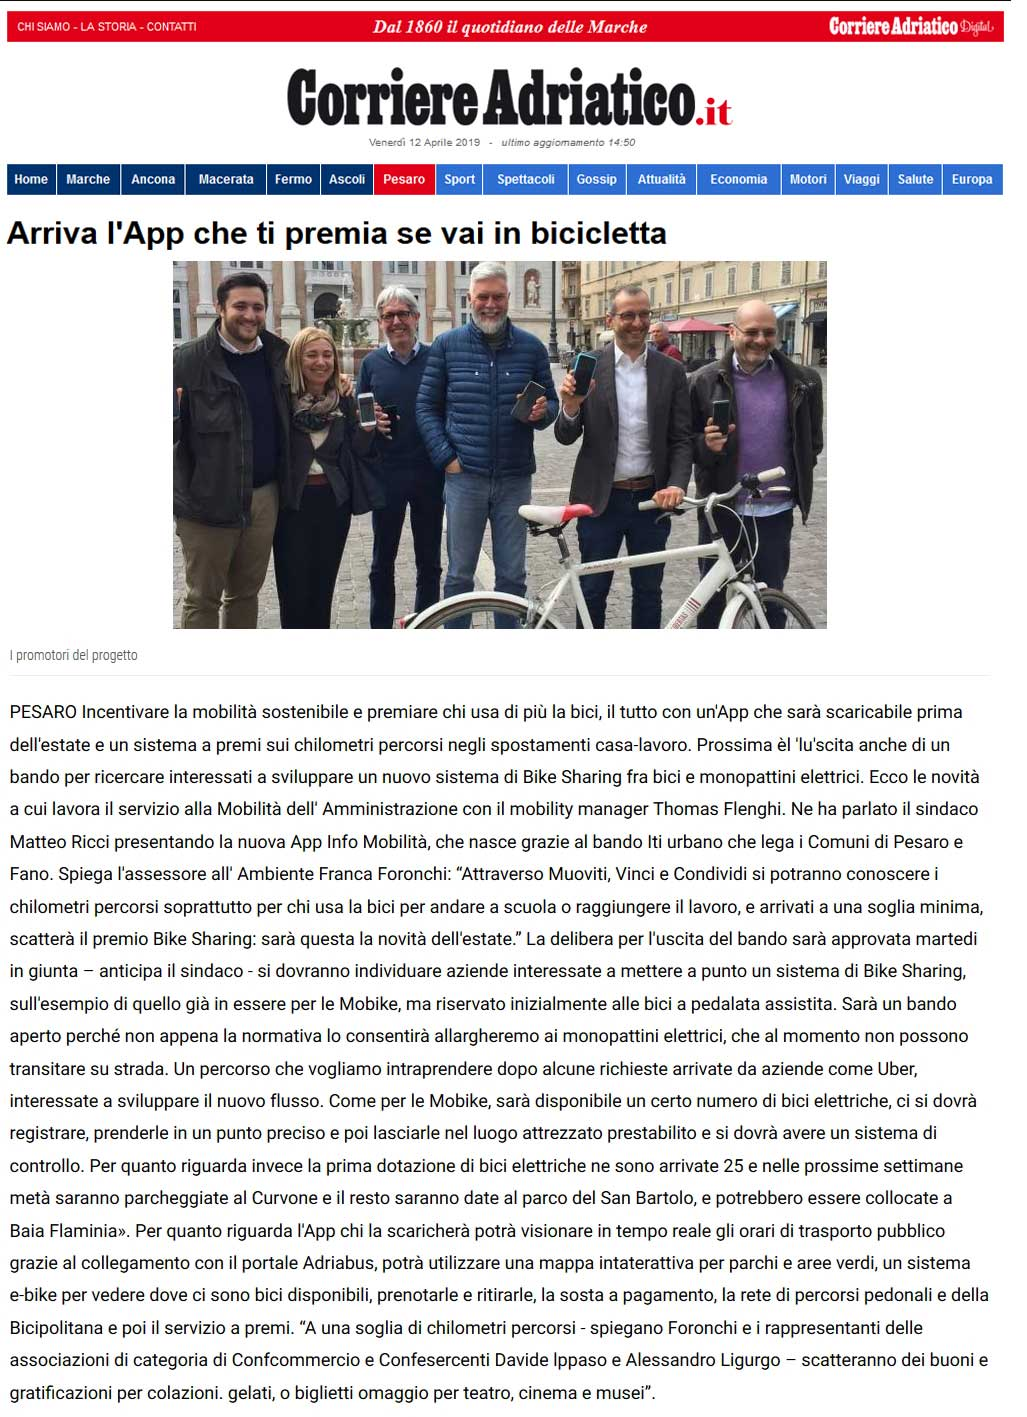 20190412-Corriere-Adriatico-12-Aprile-2019-Pesaro-App-Bicicletta.jpg